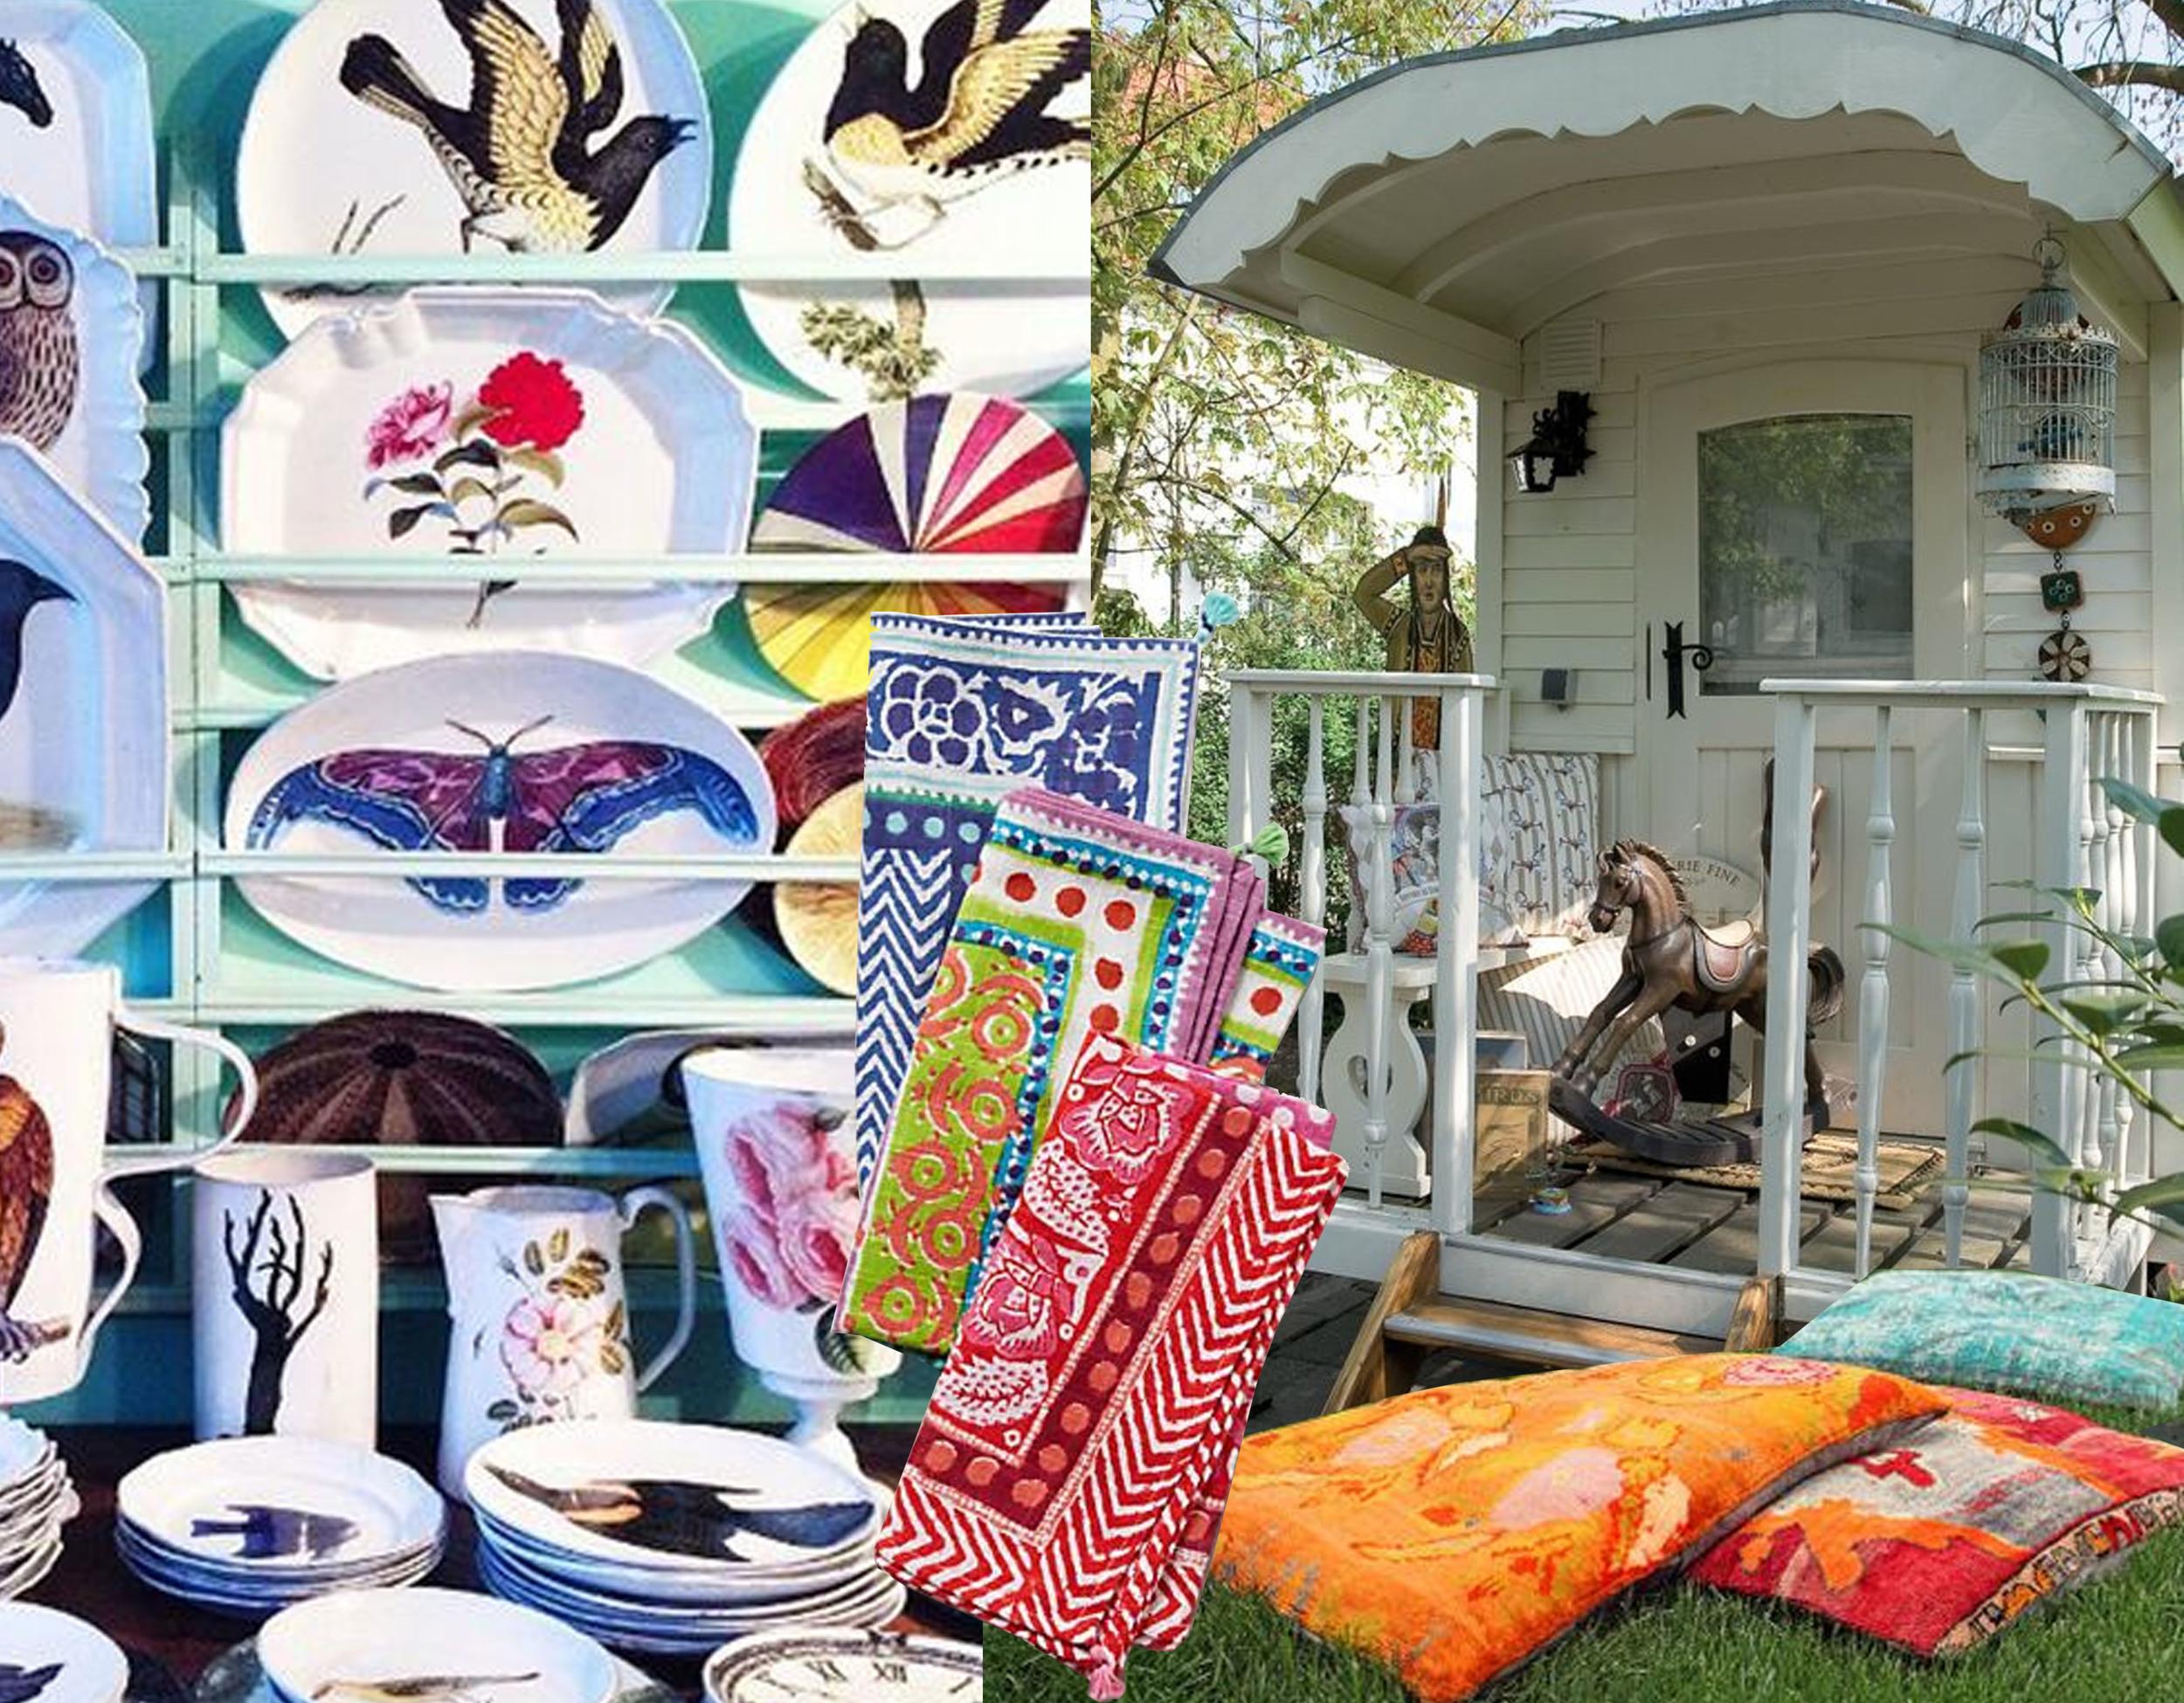 stier de Villate via  DuJour  - Caicos napkin  Antropologie  - Vardo wagon  Beltima  - floor cushion  Istanbul Art Craft